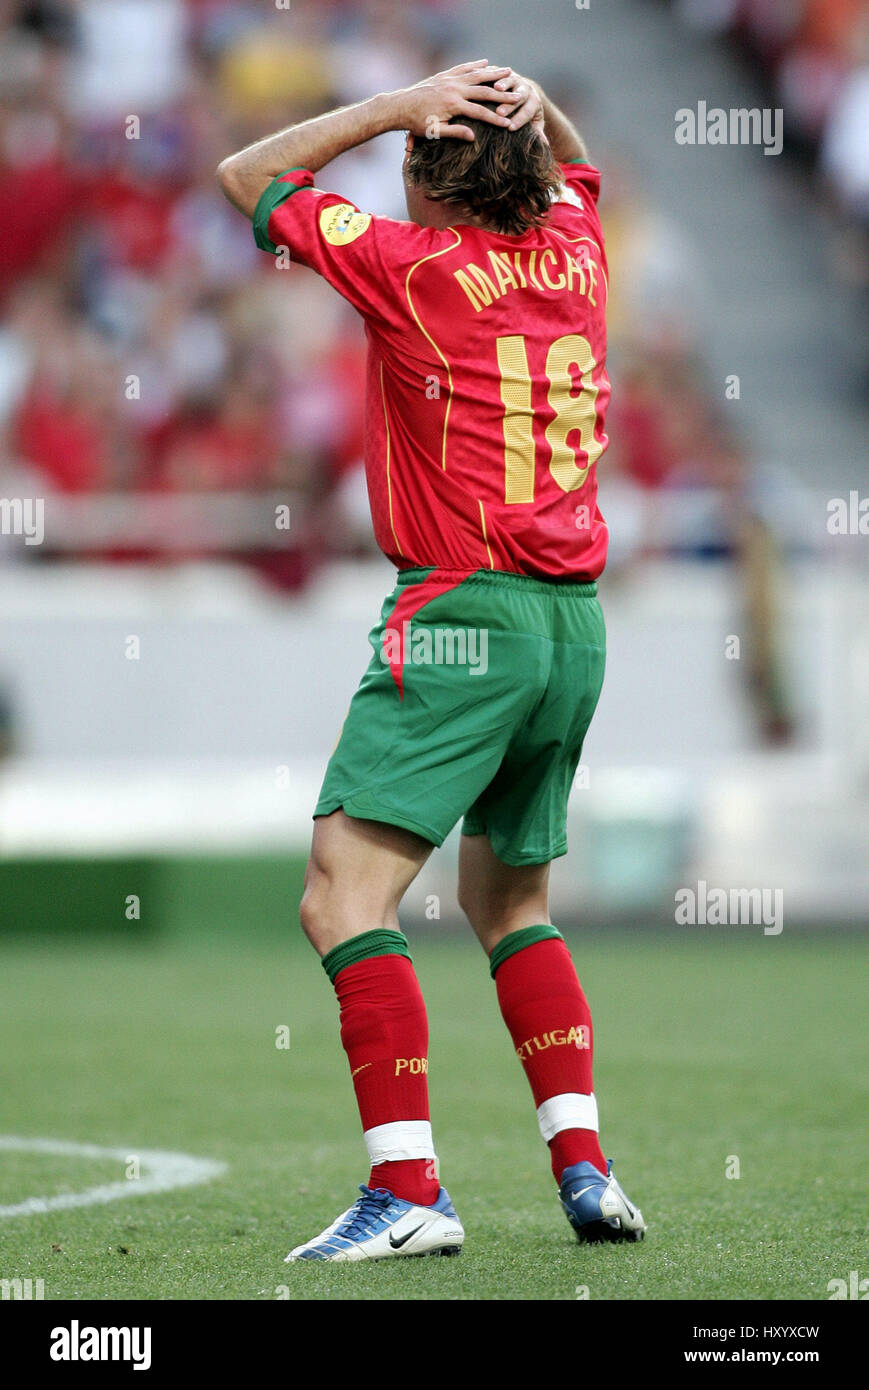 Fc Porto Stadium Profil Pemain Sepak Bola